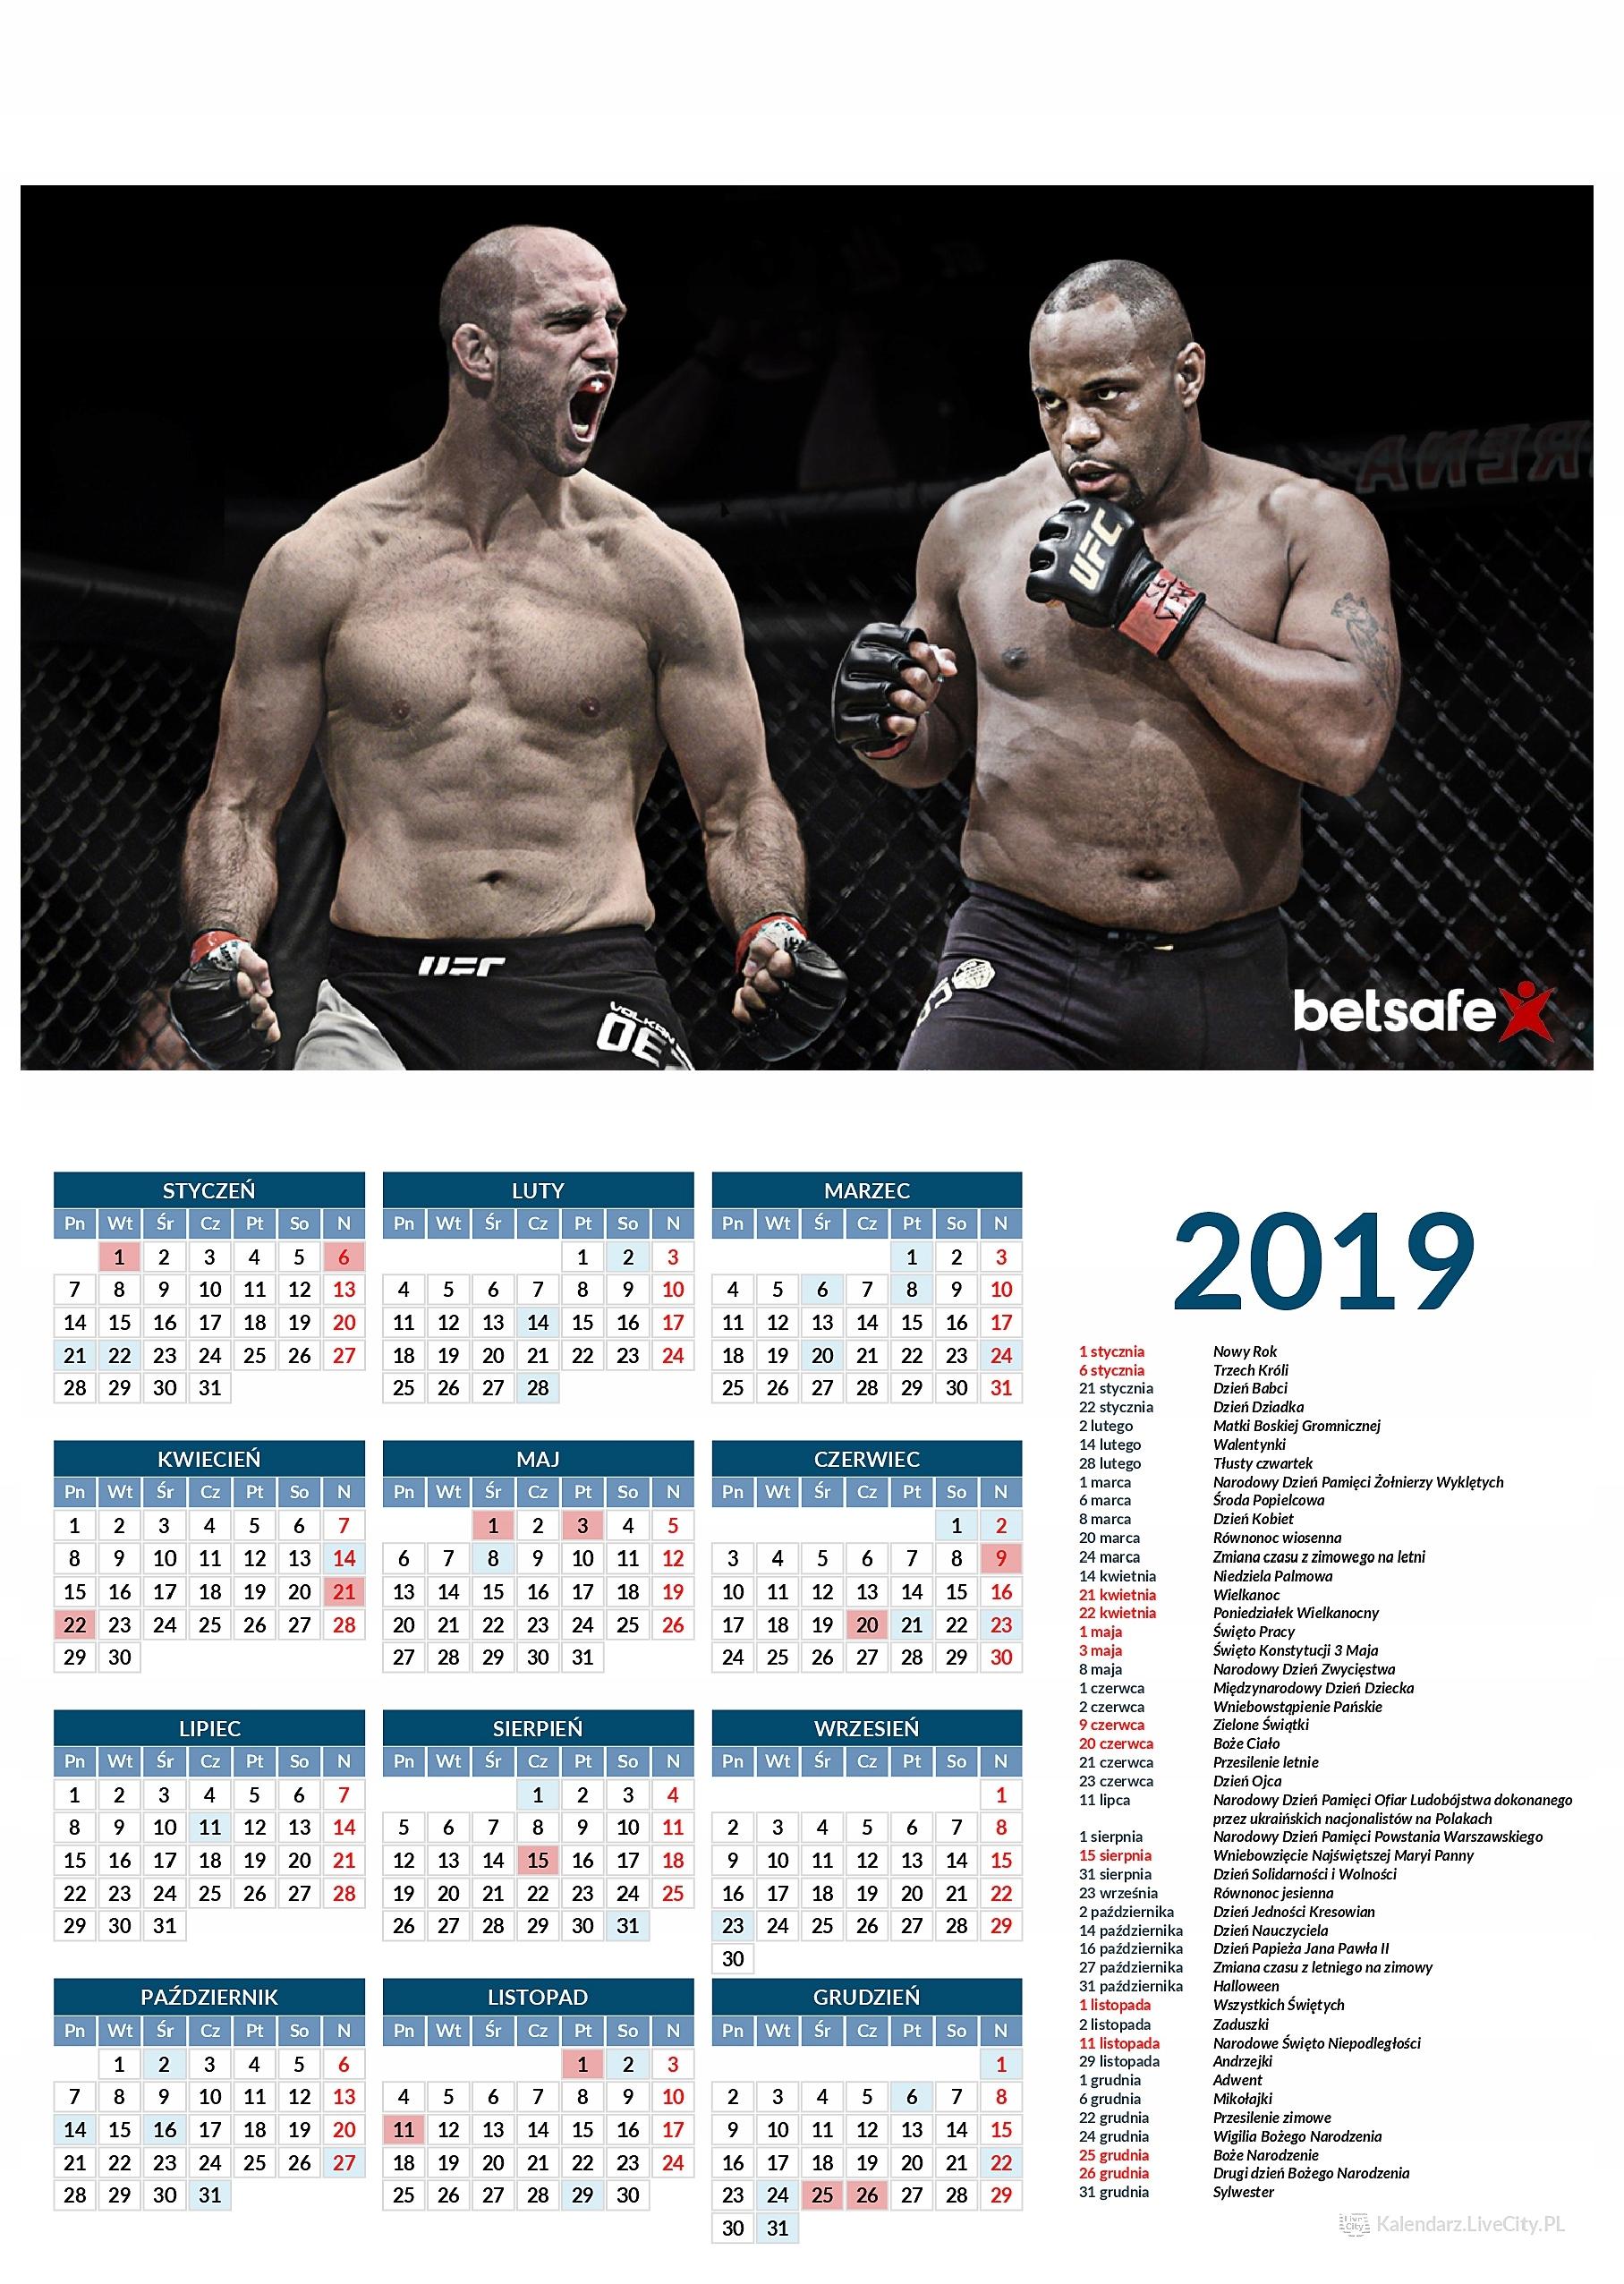 Kalendarz 2019 MMA Daniel Cormier